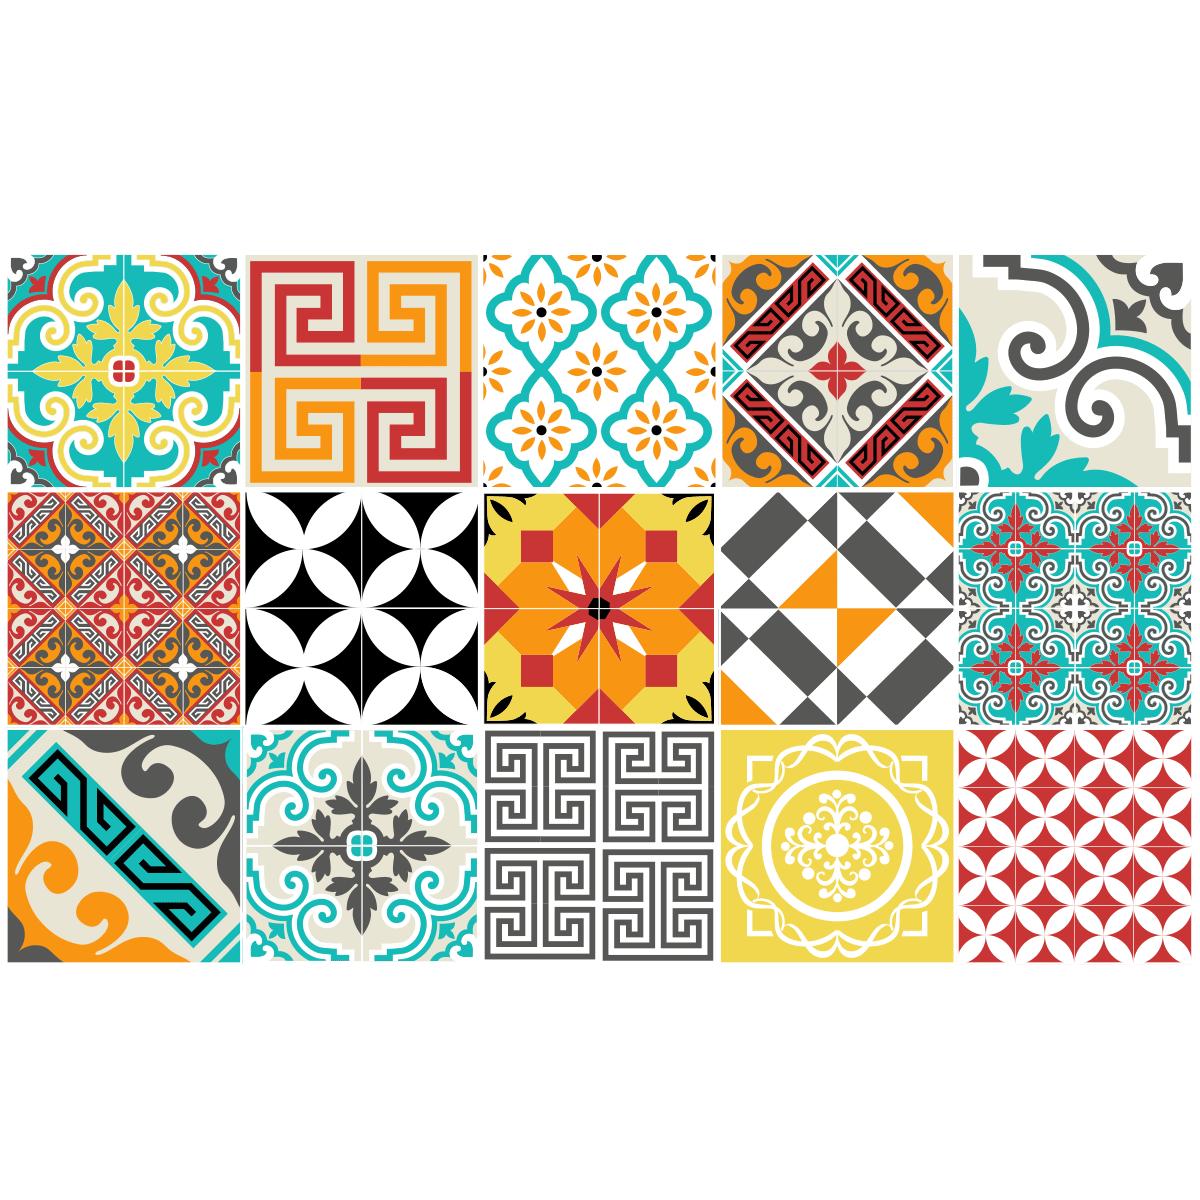 15 Stickers Carrelages Azulejos Mosaique Multicolore Avec Images